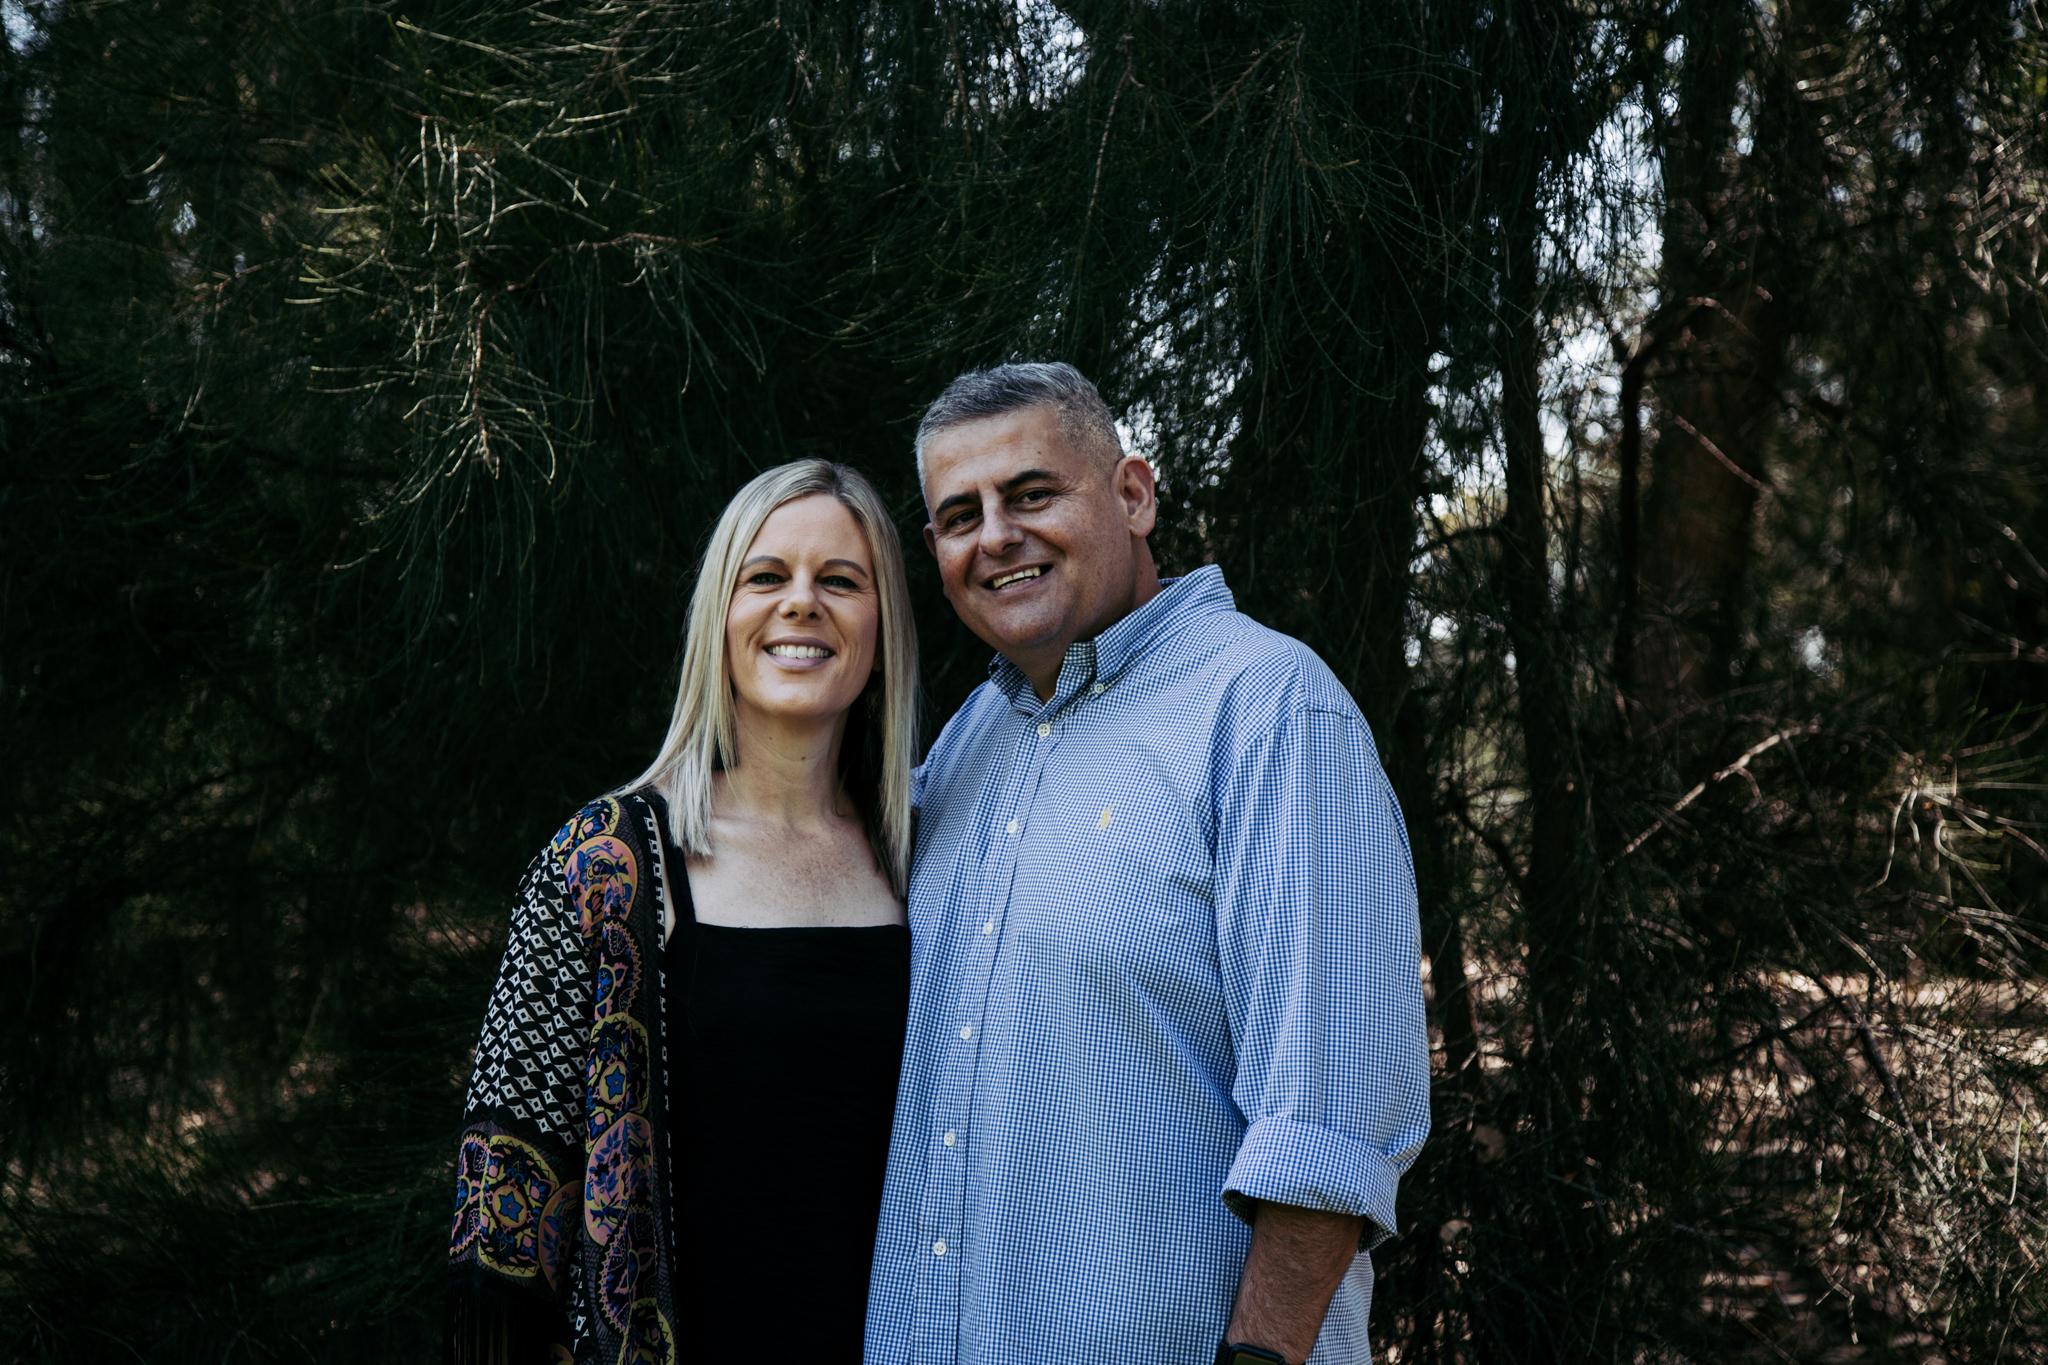 Scott & Rachael Hanzy